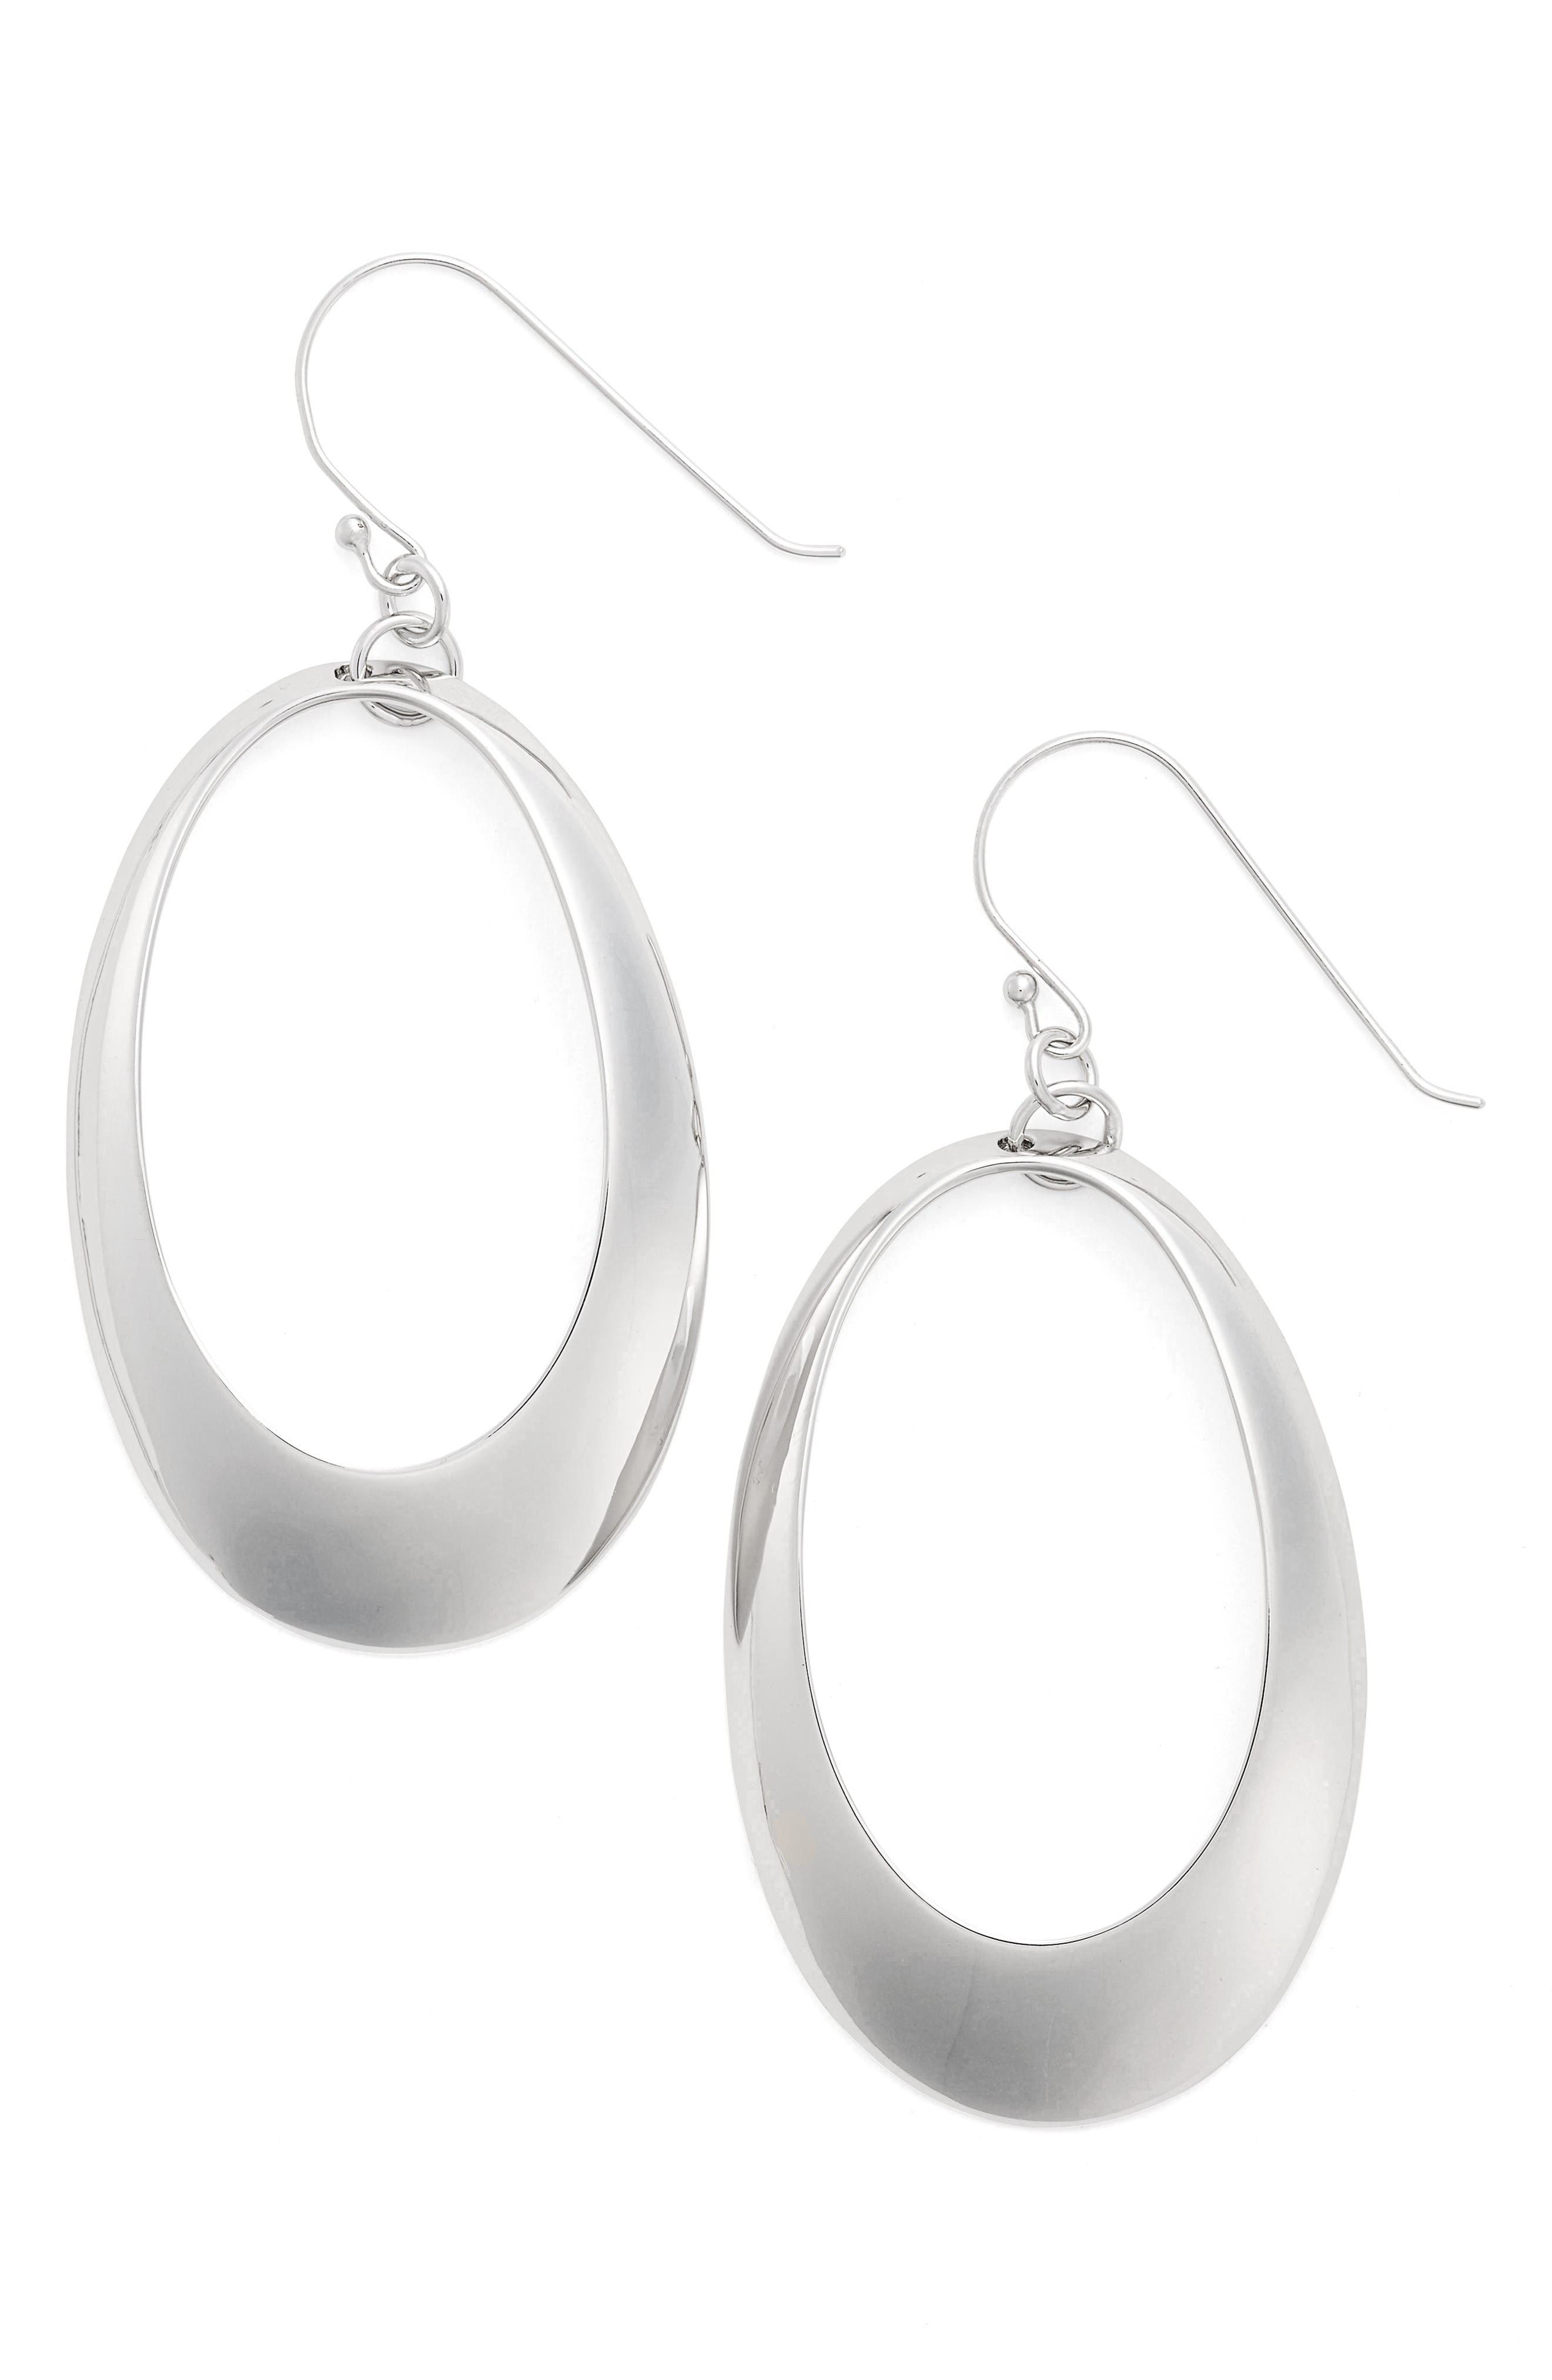 Alternate Image 1 Selected - Argento Vivo Large Oval Drop Earrings